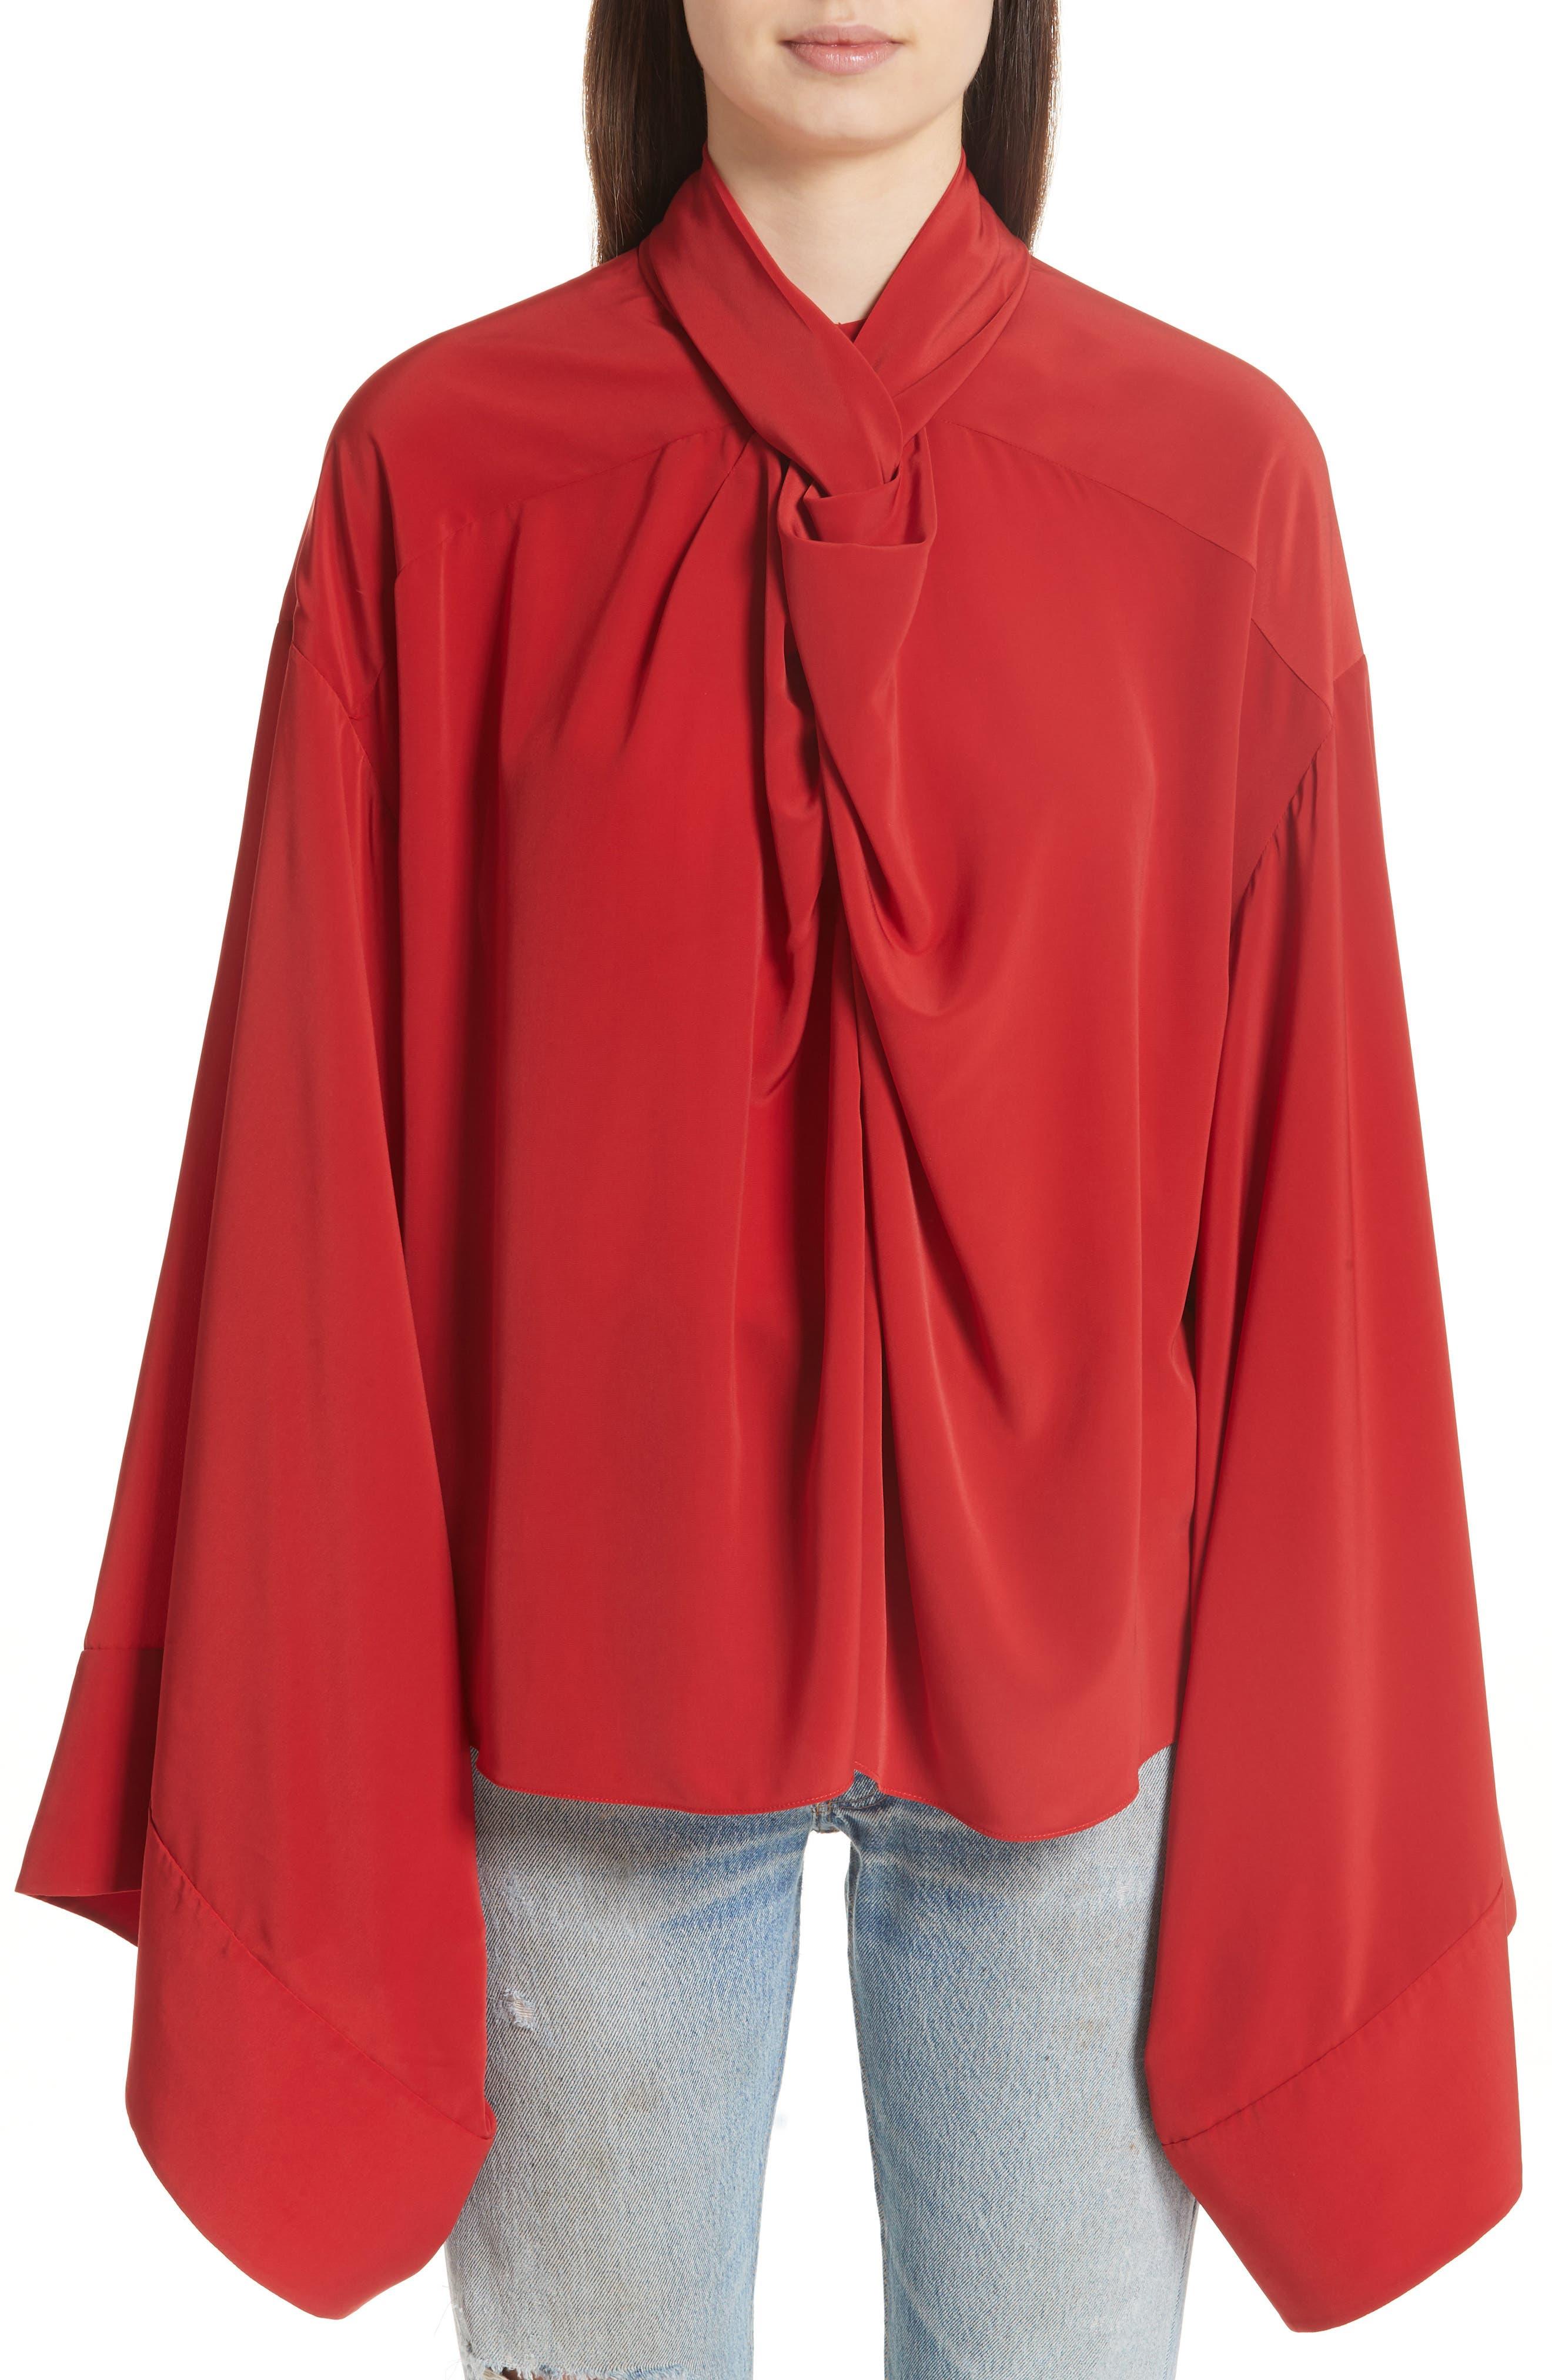 Kimono Sleeve Blouse,                             Main thumbnail 1, color,                             Red